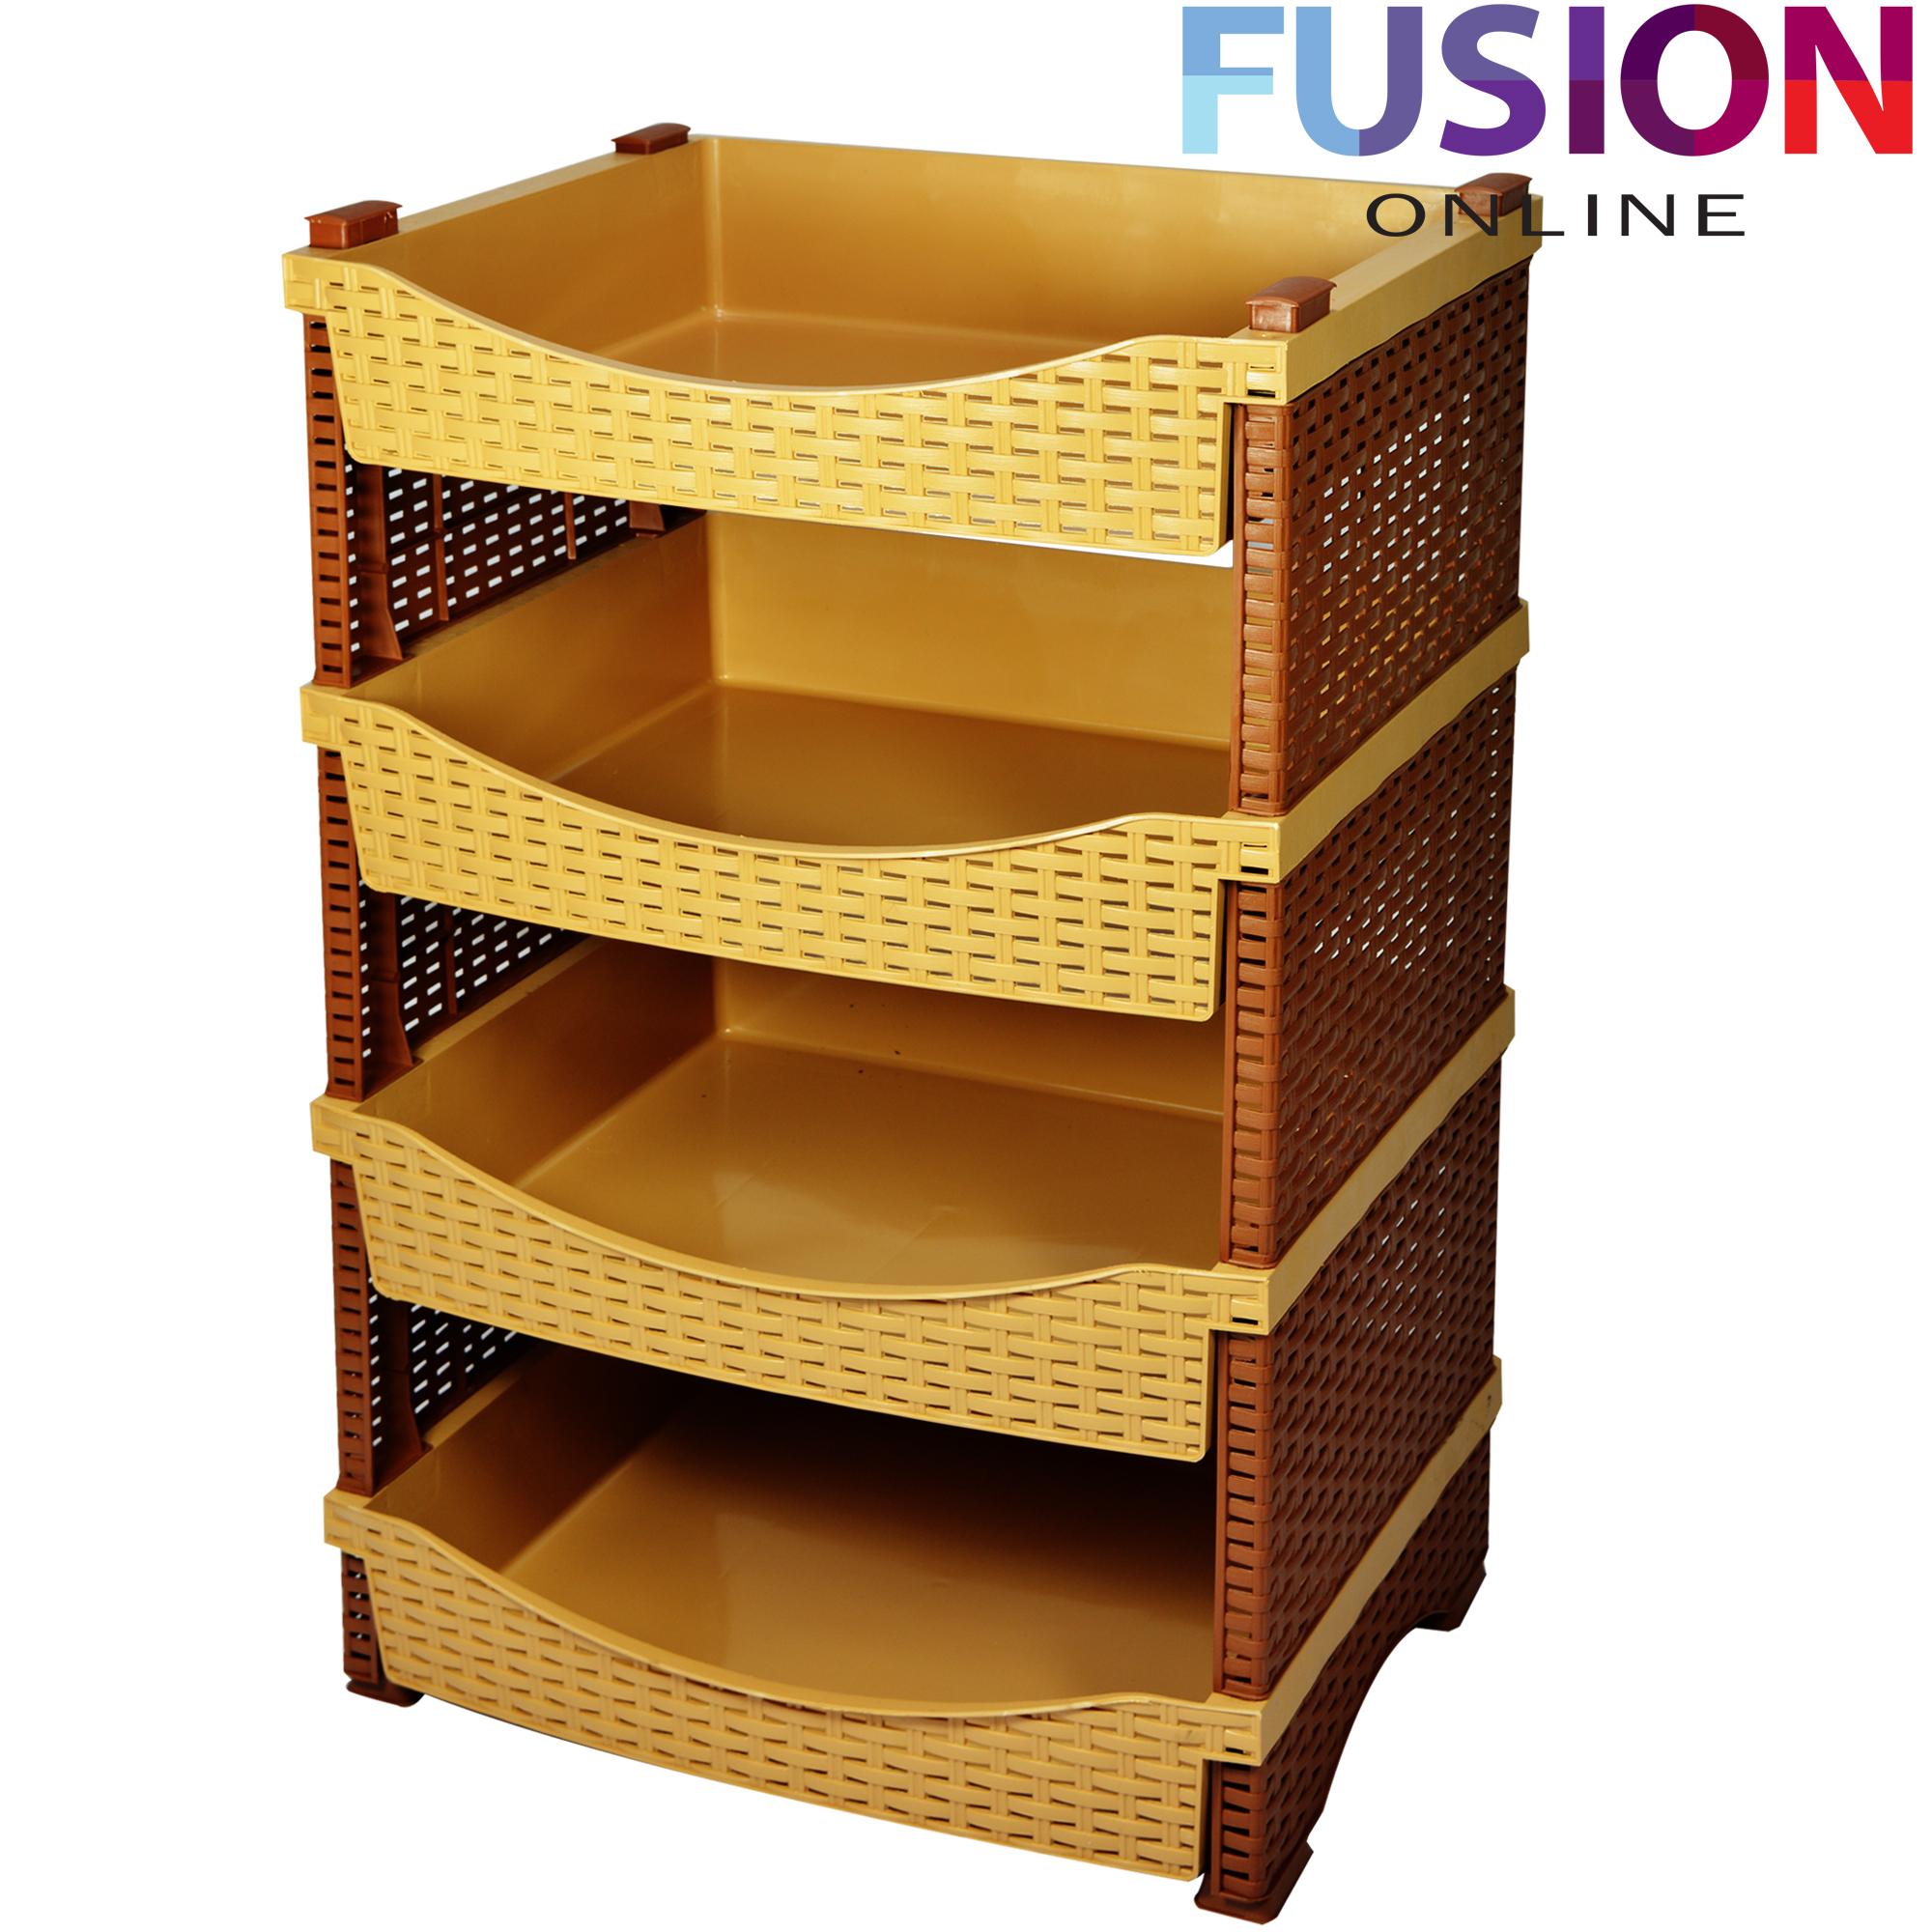 Kitchen Vegetable Storage Baskets: 4 Tier Rattan Plastic Vegetable Fruit Rack Basket Kitchen